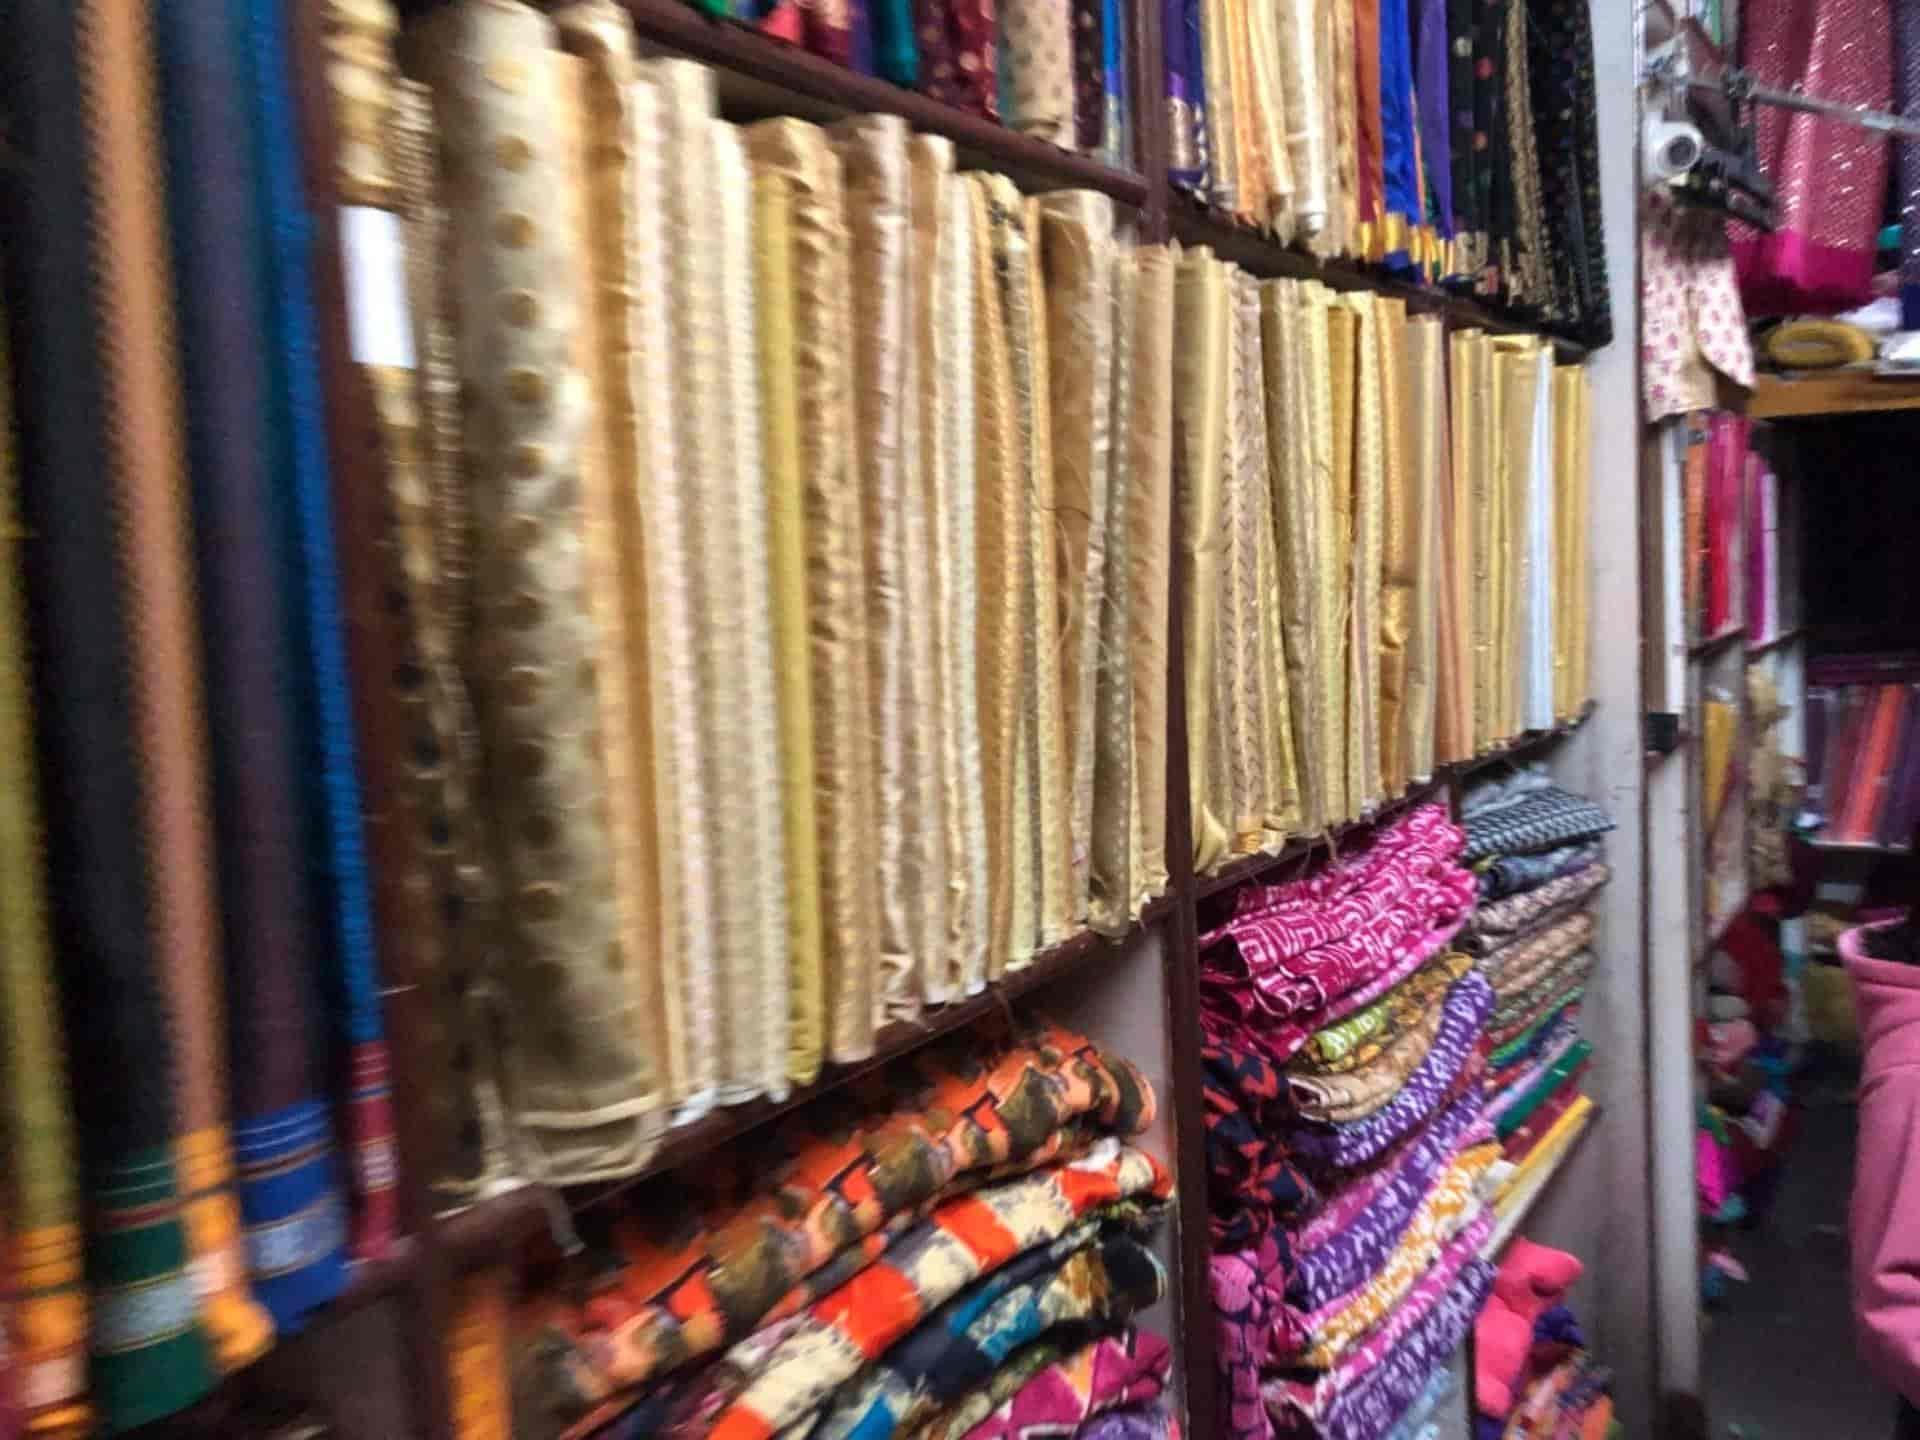 Aakash Matching & Fabrics, Manik Baug - Matching Centers in